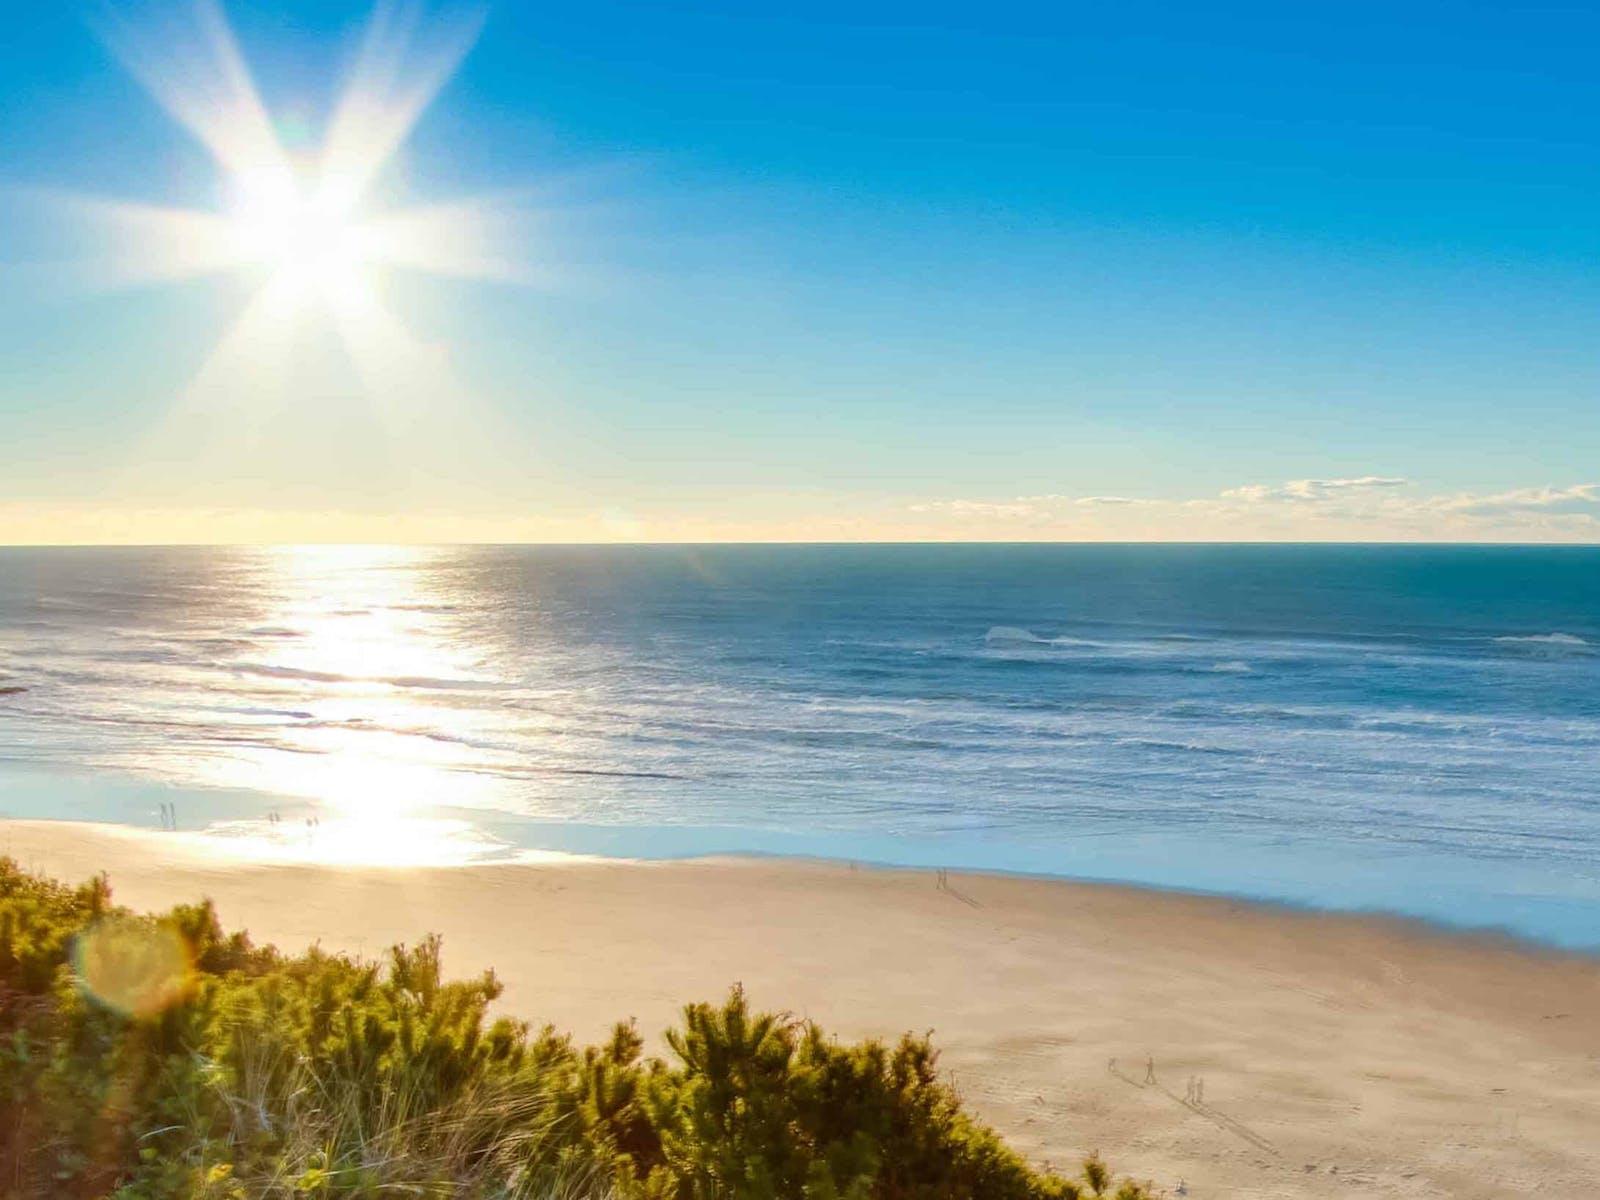 Sun shining over the ocean on the Oregon Coast